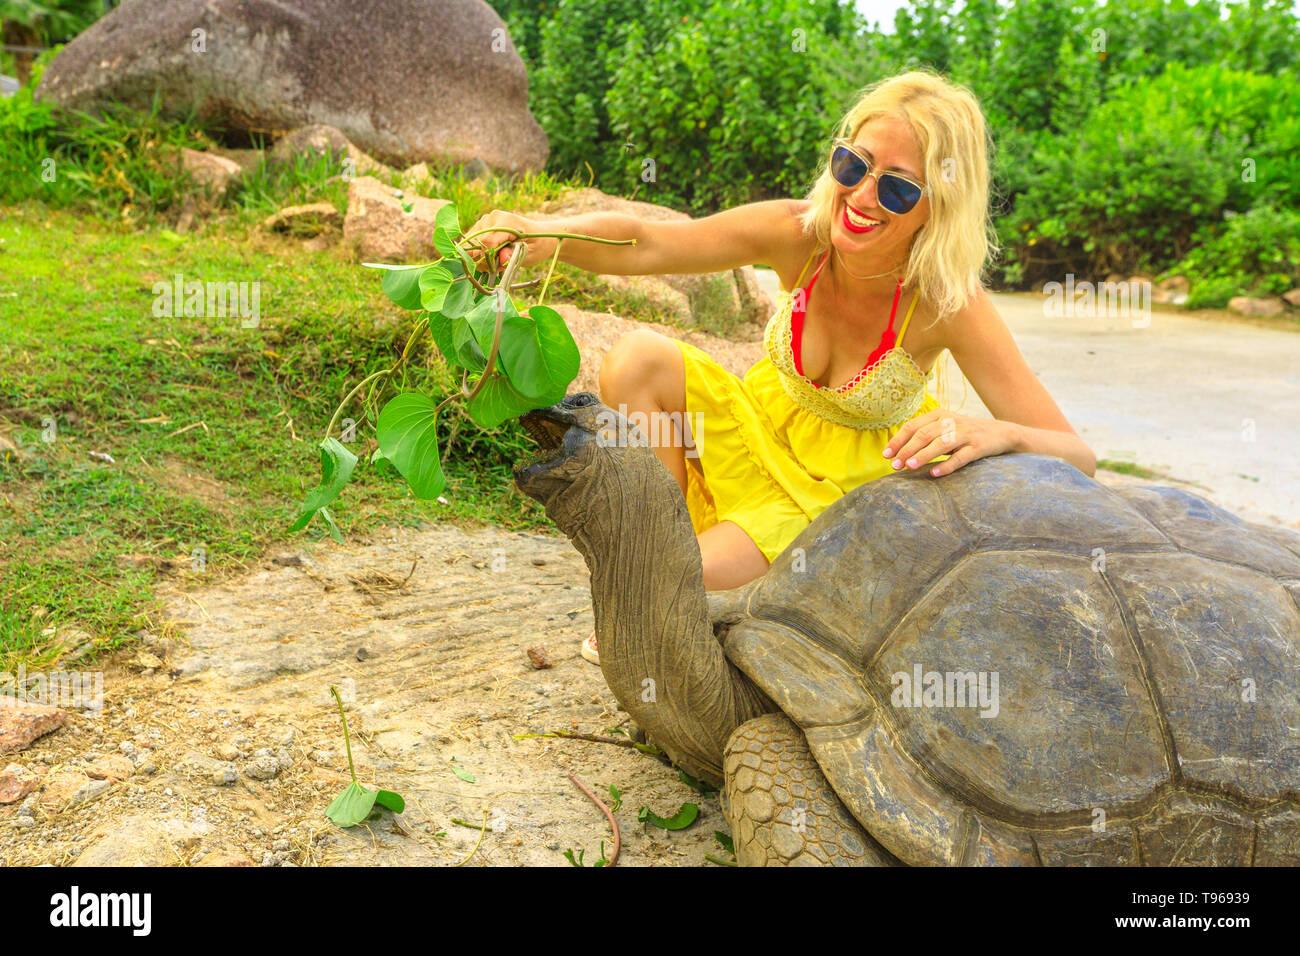 Elegant caucasian happy tourist woman feeding a male of Aldabra Giant Tortoise, Aldabrachelys gigantea, a tortoise native to Aldabra atoll. Popular - Stock Image